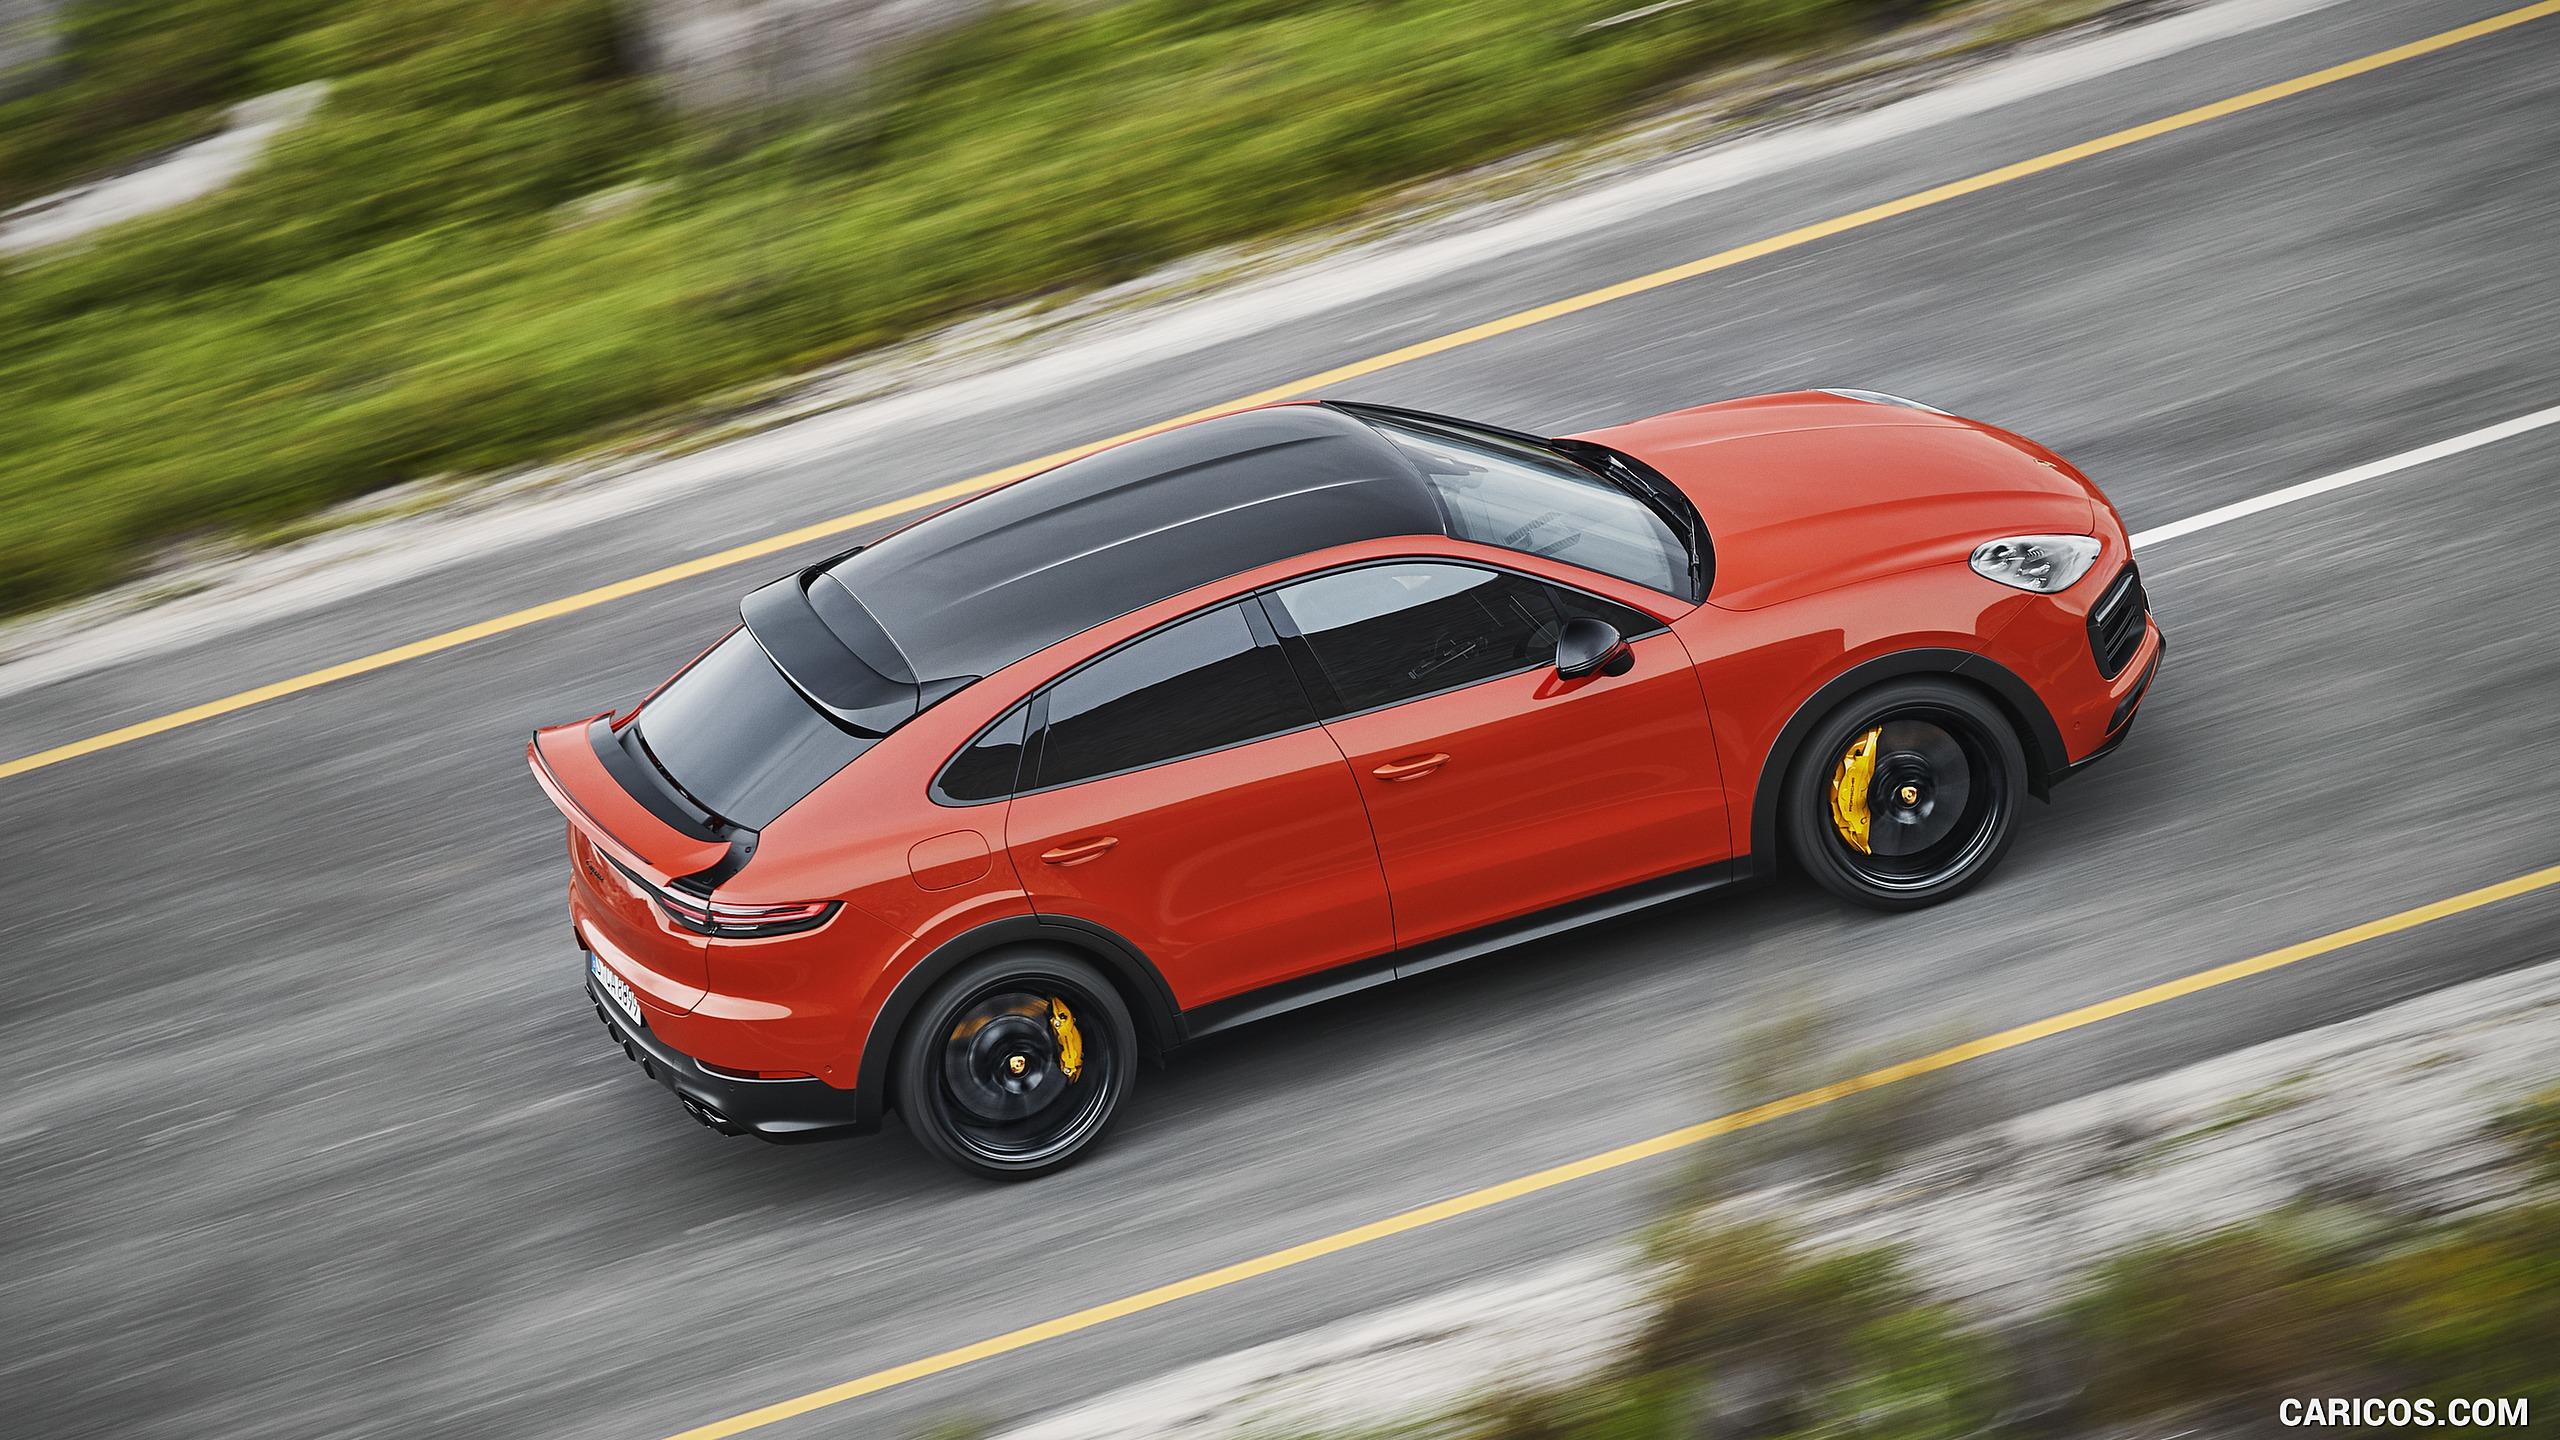 2020 Porsche Cayenne Coupe   Top HD Wallpaper 6 2560x1440